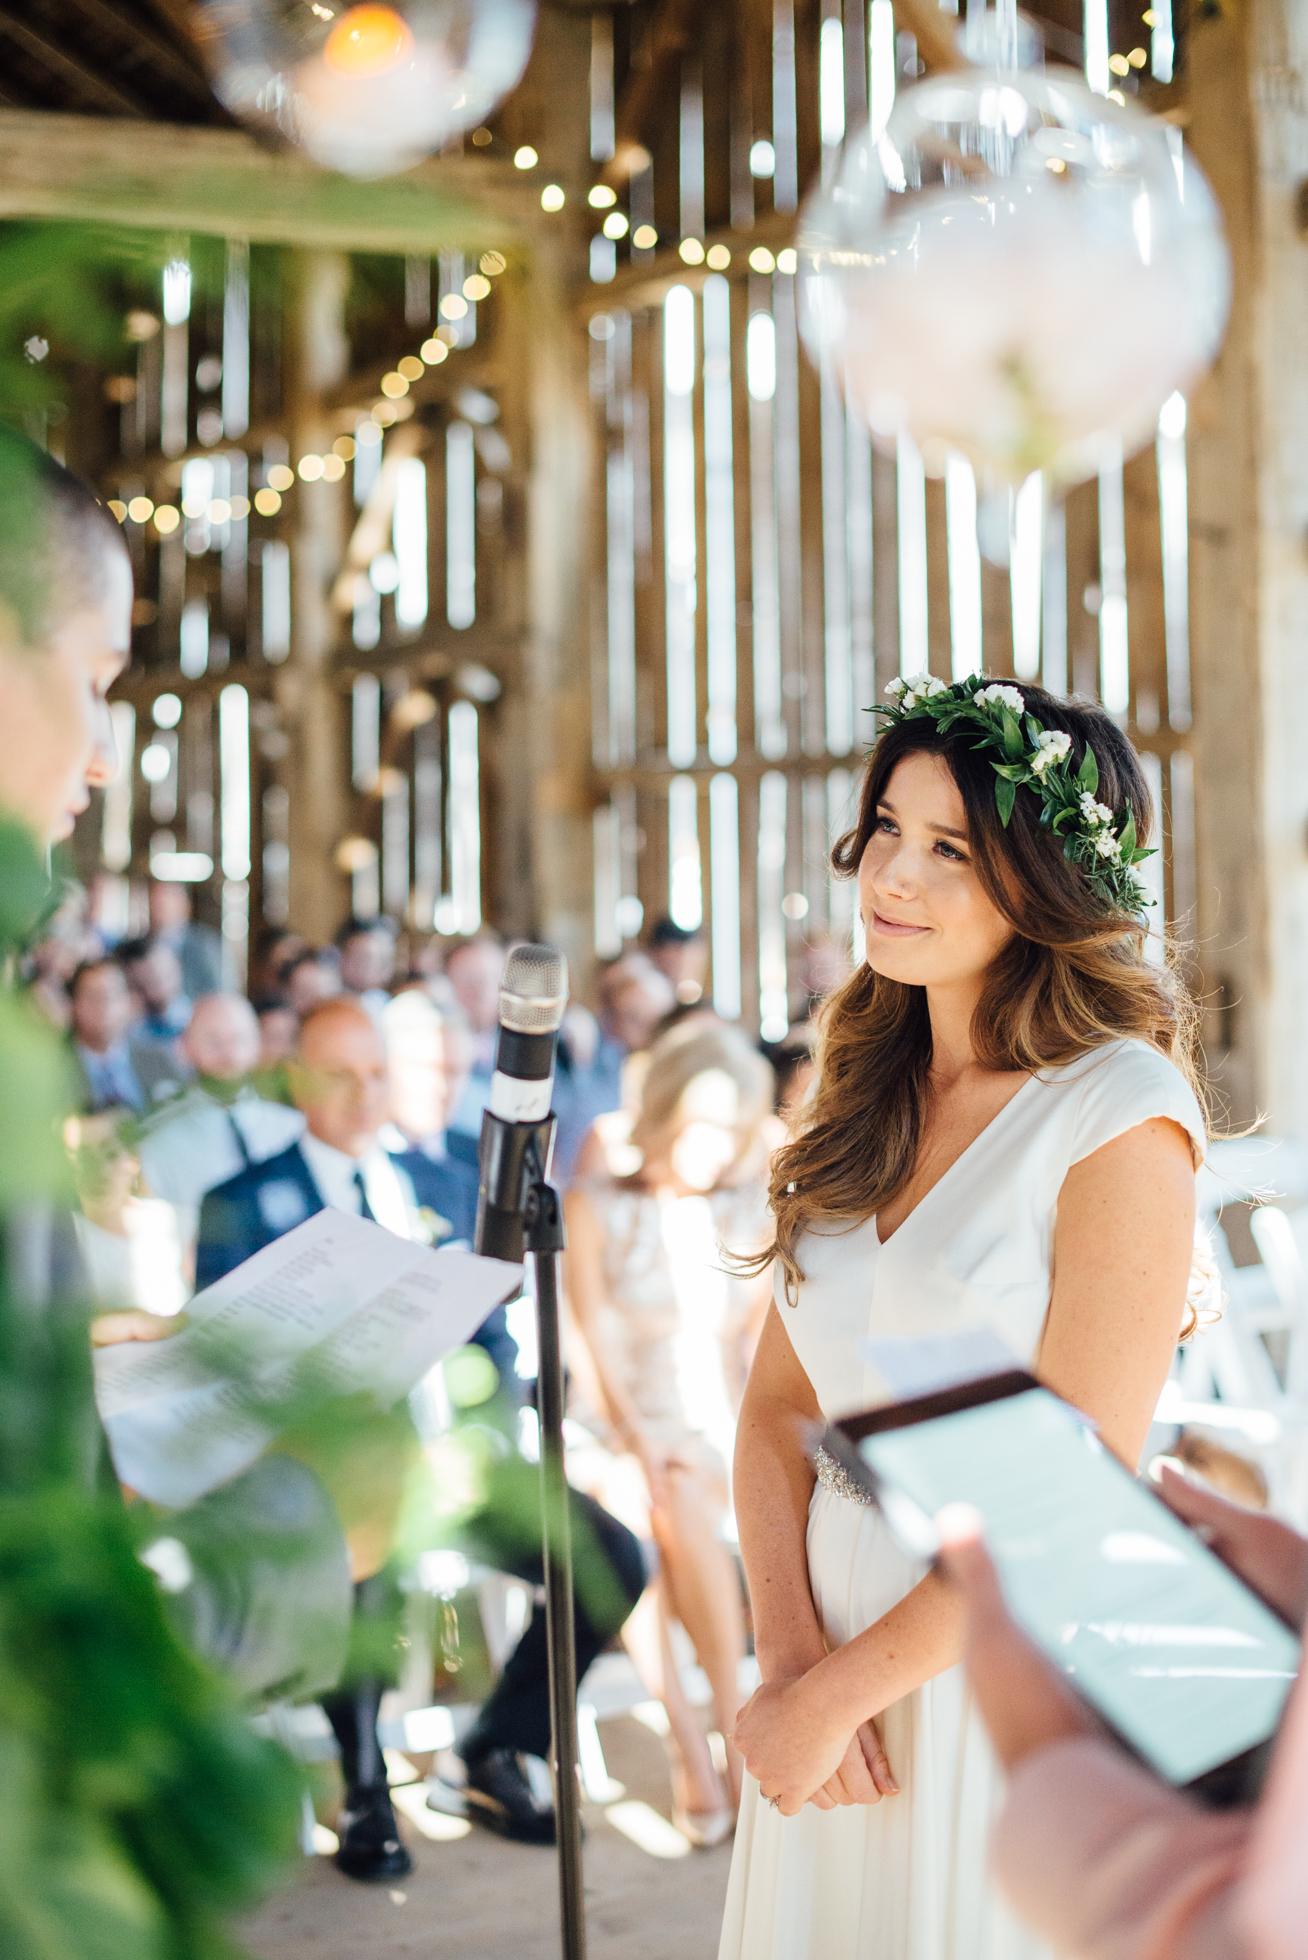 Downswell-Barn-Wedding-Photography-47.jpg